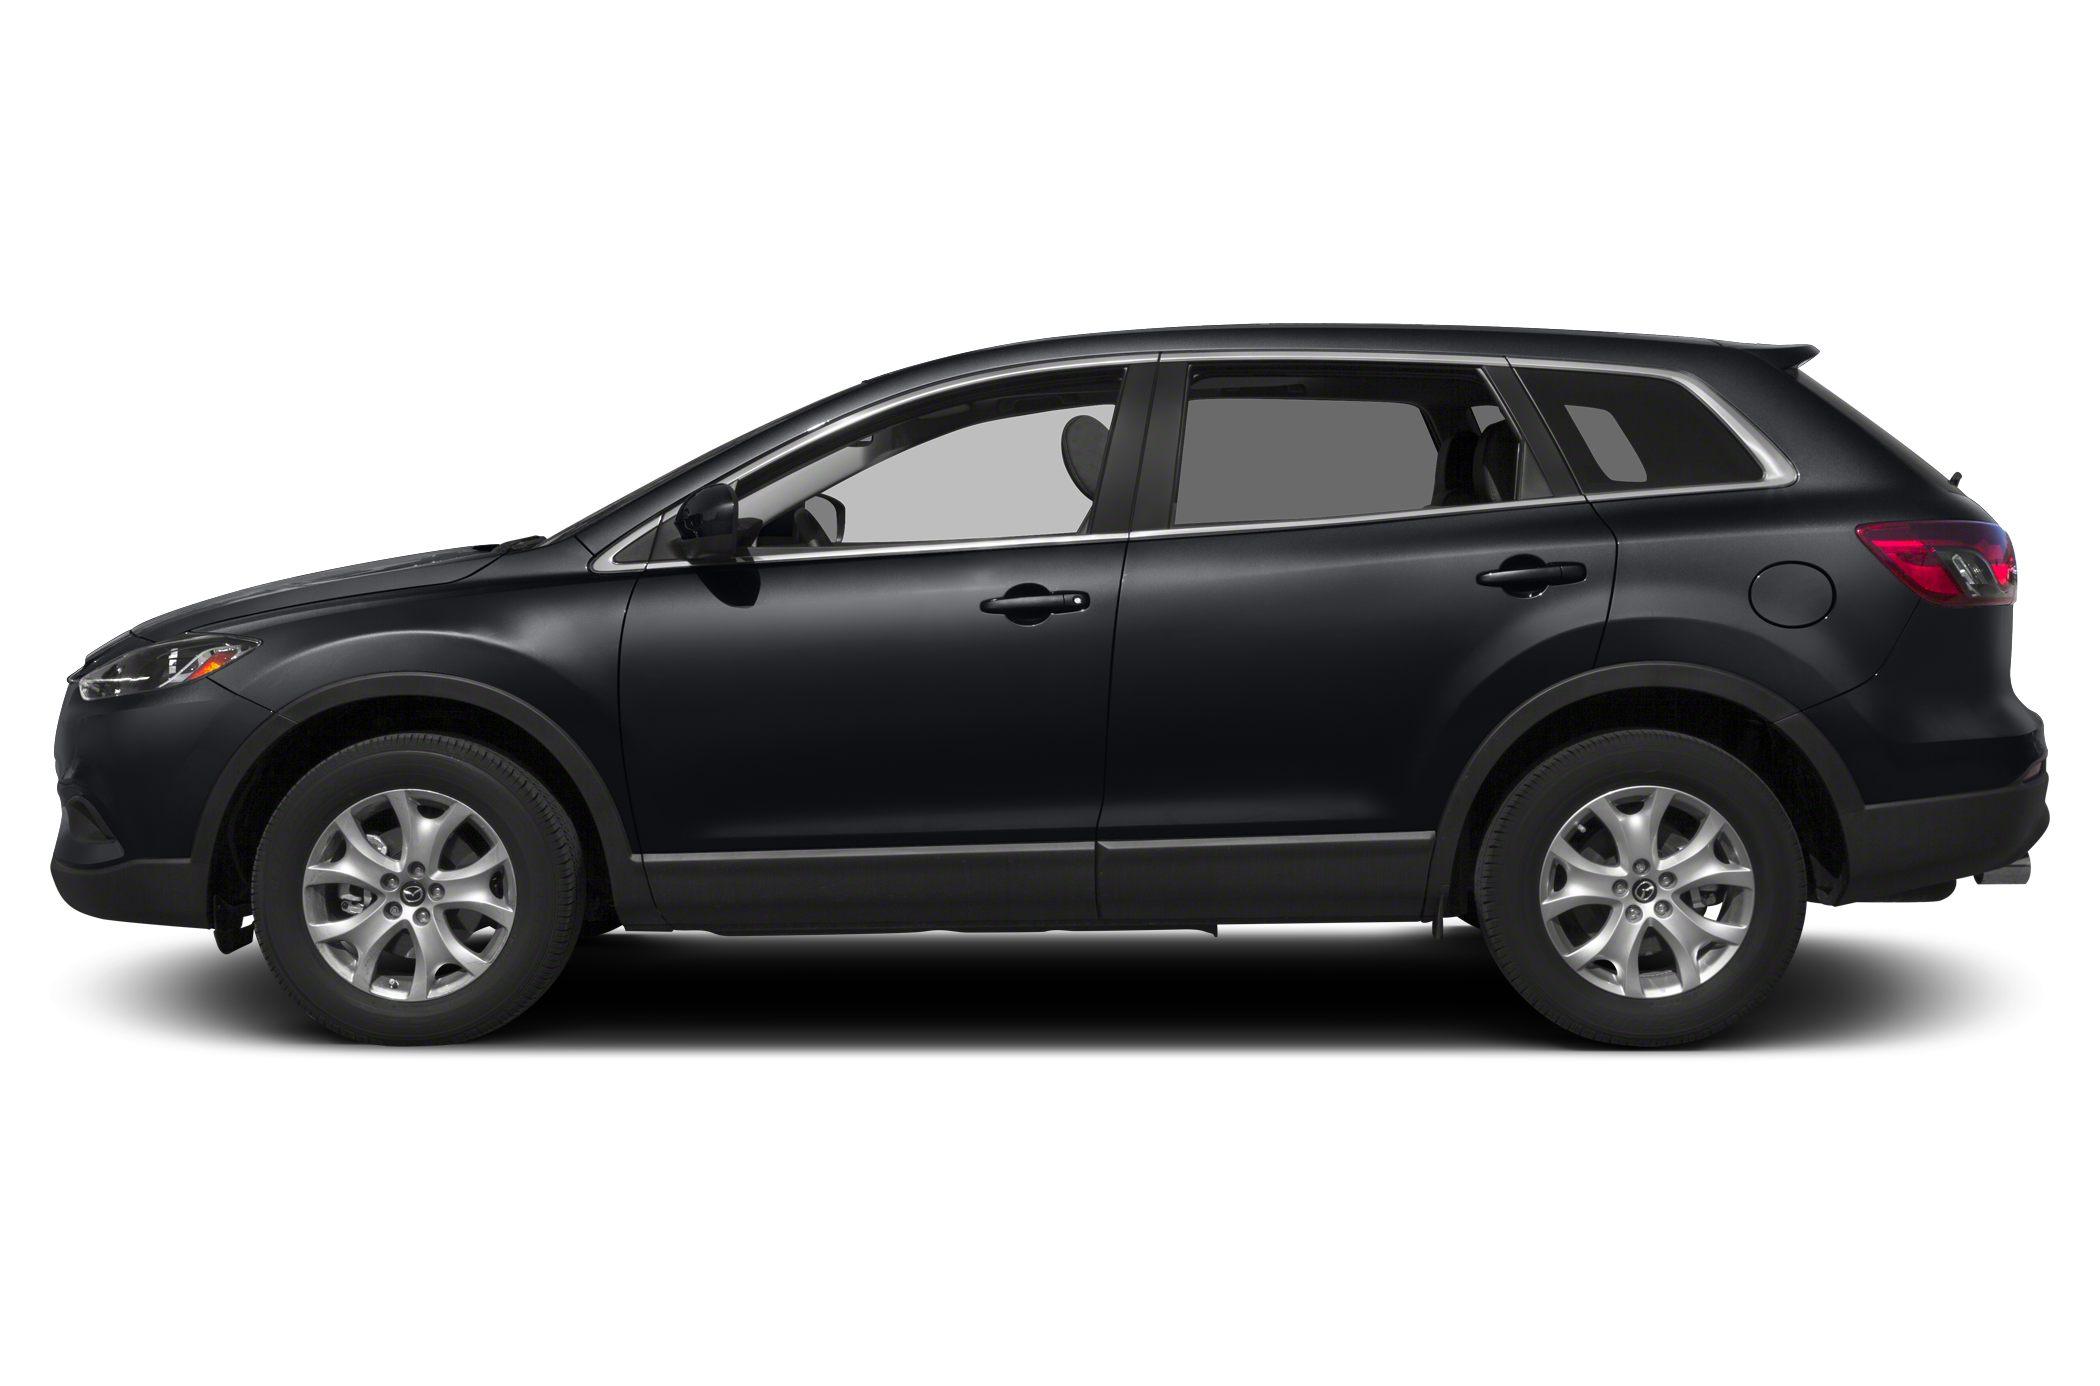 minivan the autoweek touring photo mazda skip notes grand article car reviews review cx